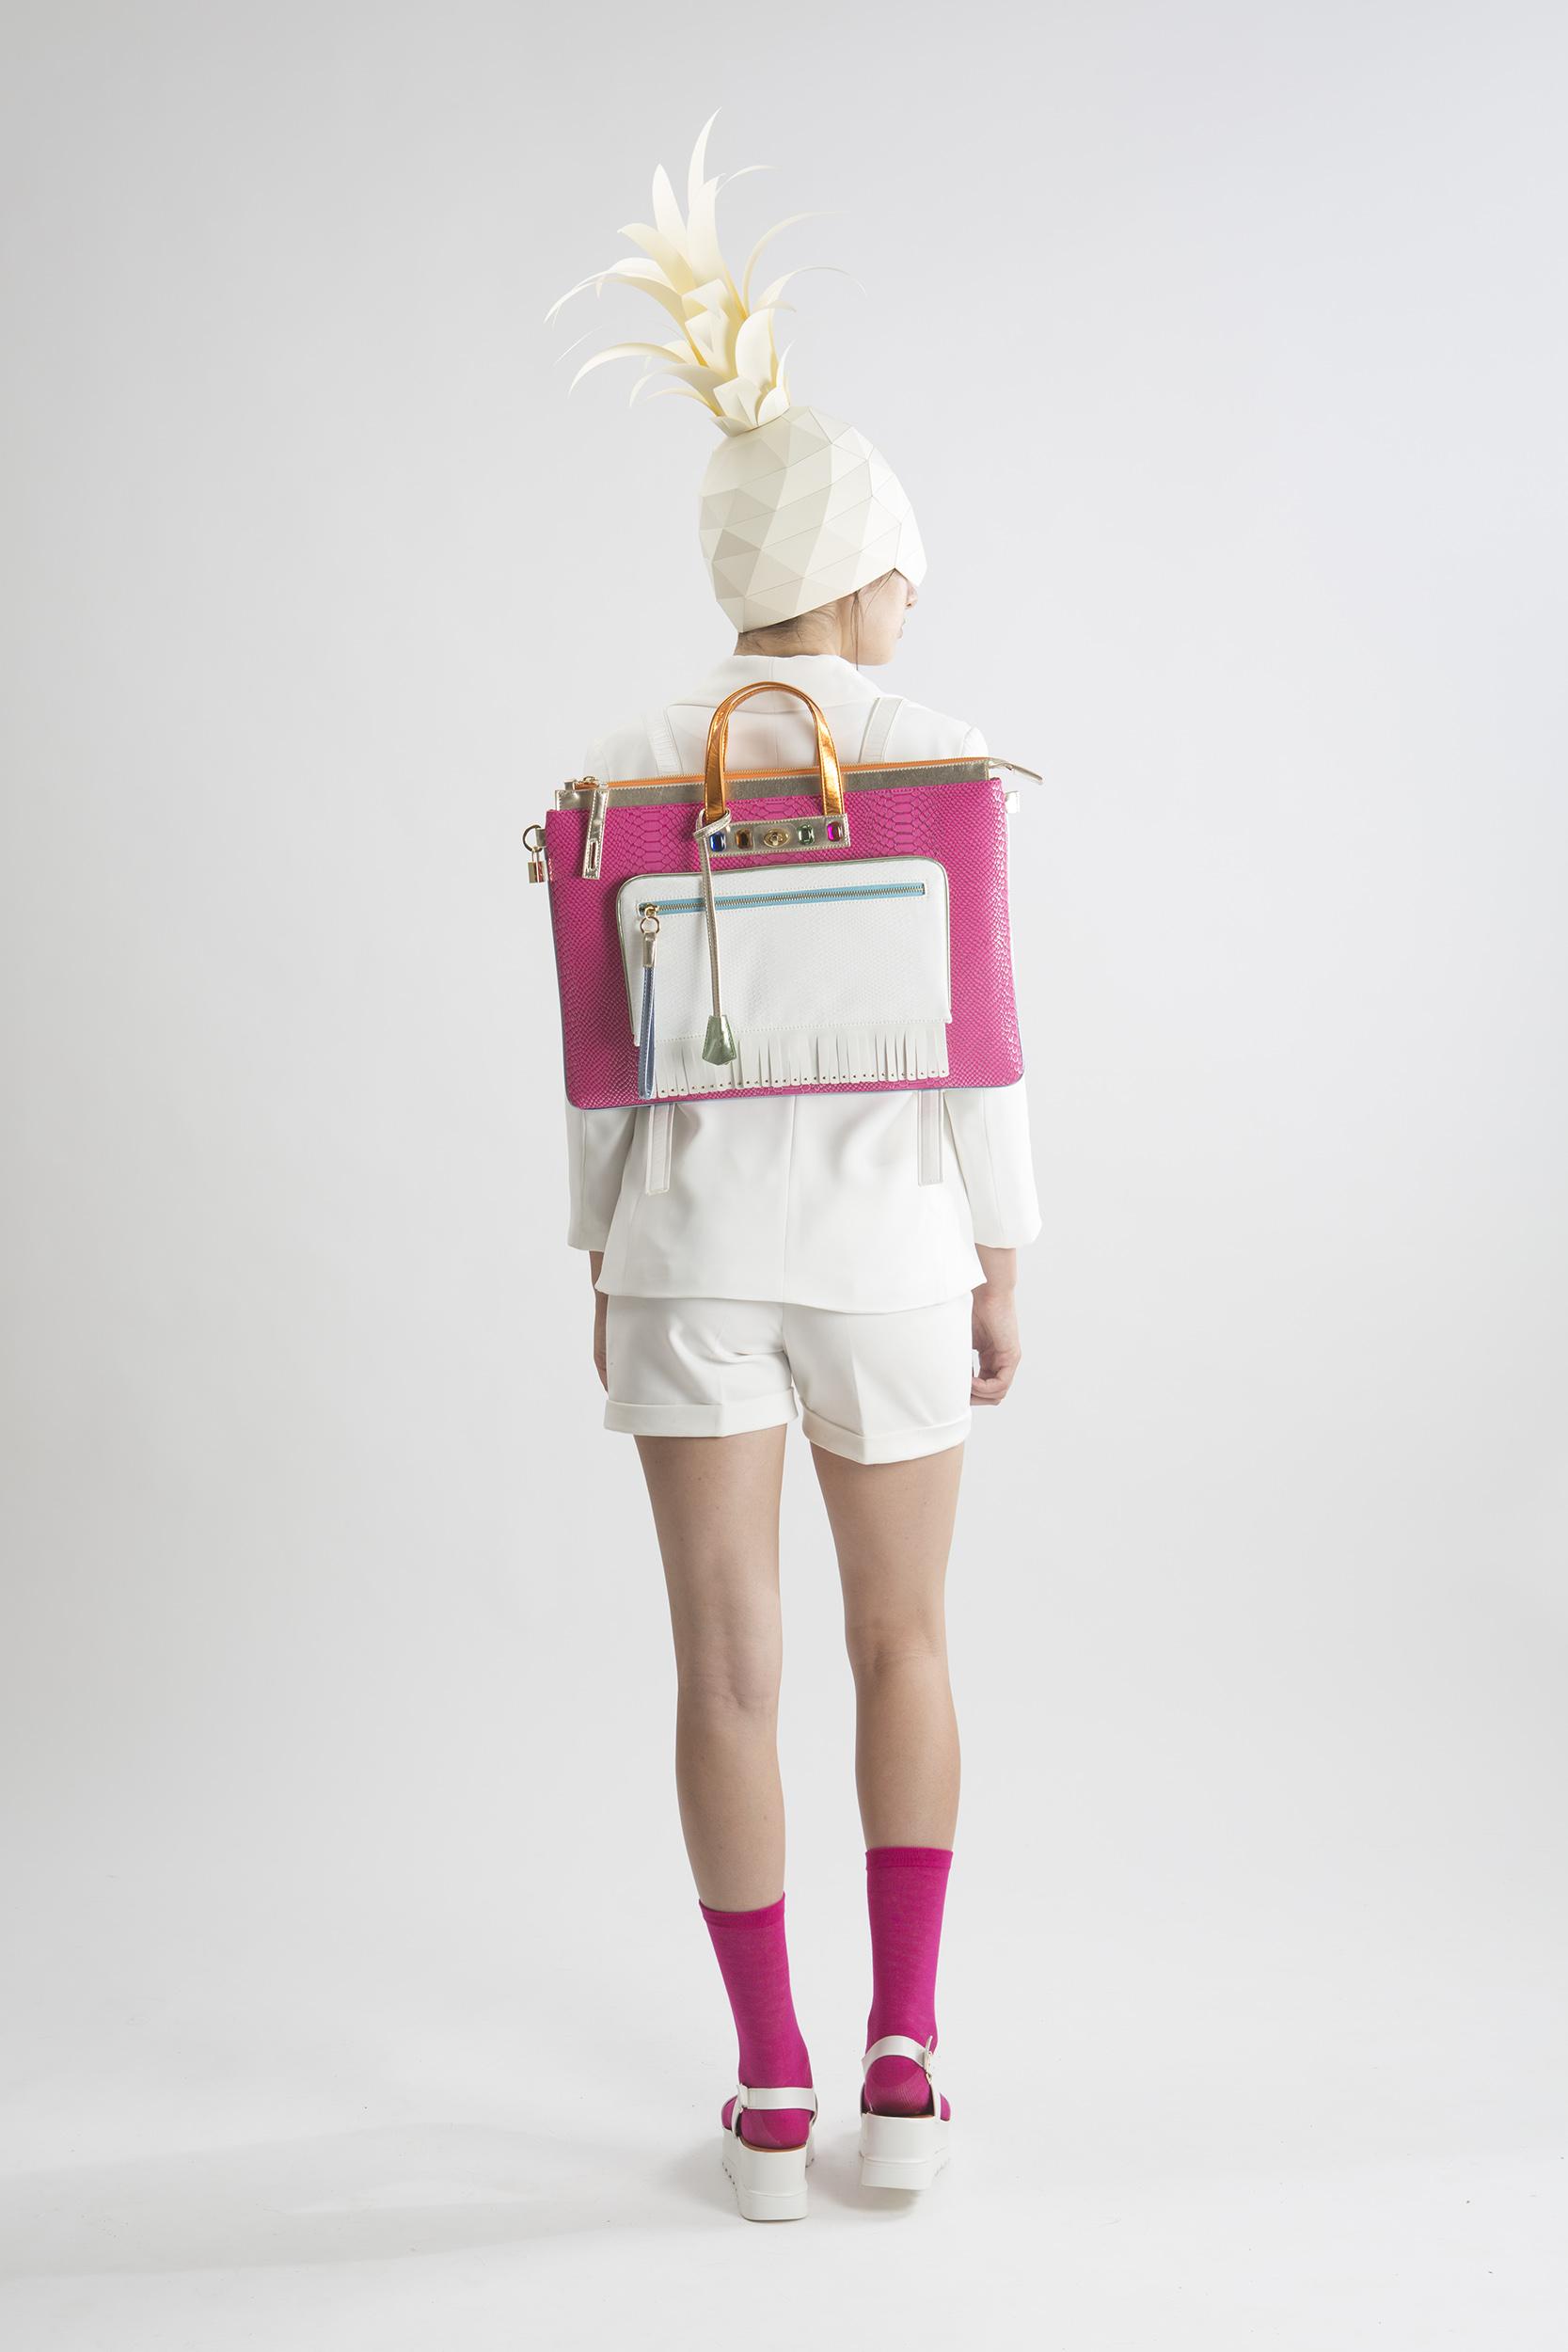 FruitenVeg-MULAYA bag-vegan-eco-imitation-leather-large-laptop-bag-pink-white-orange-rhinestones-nyc-handbag-designer